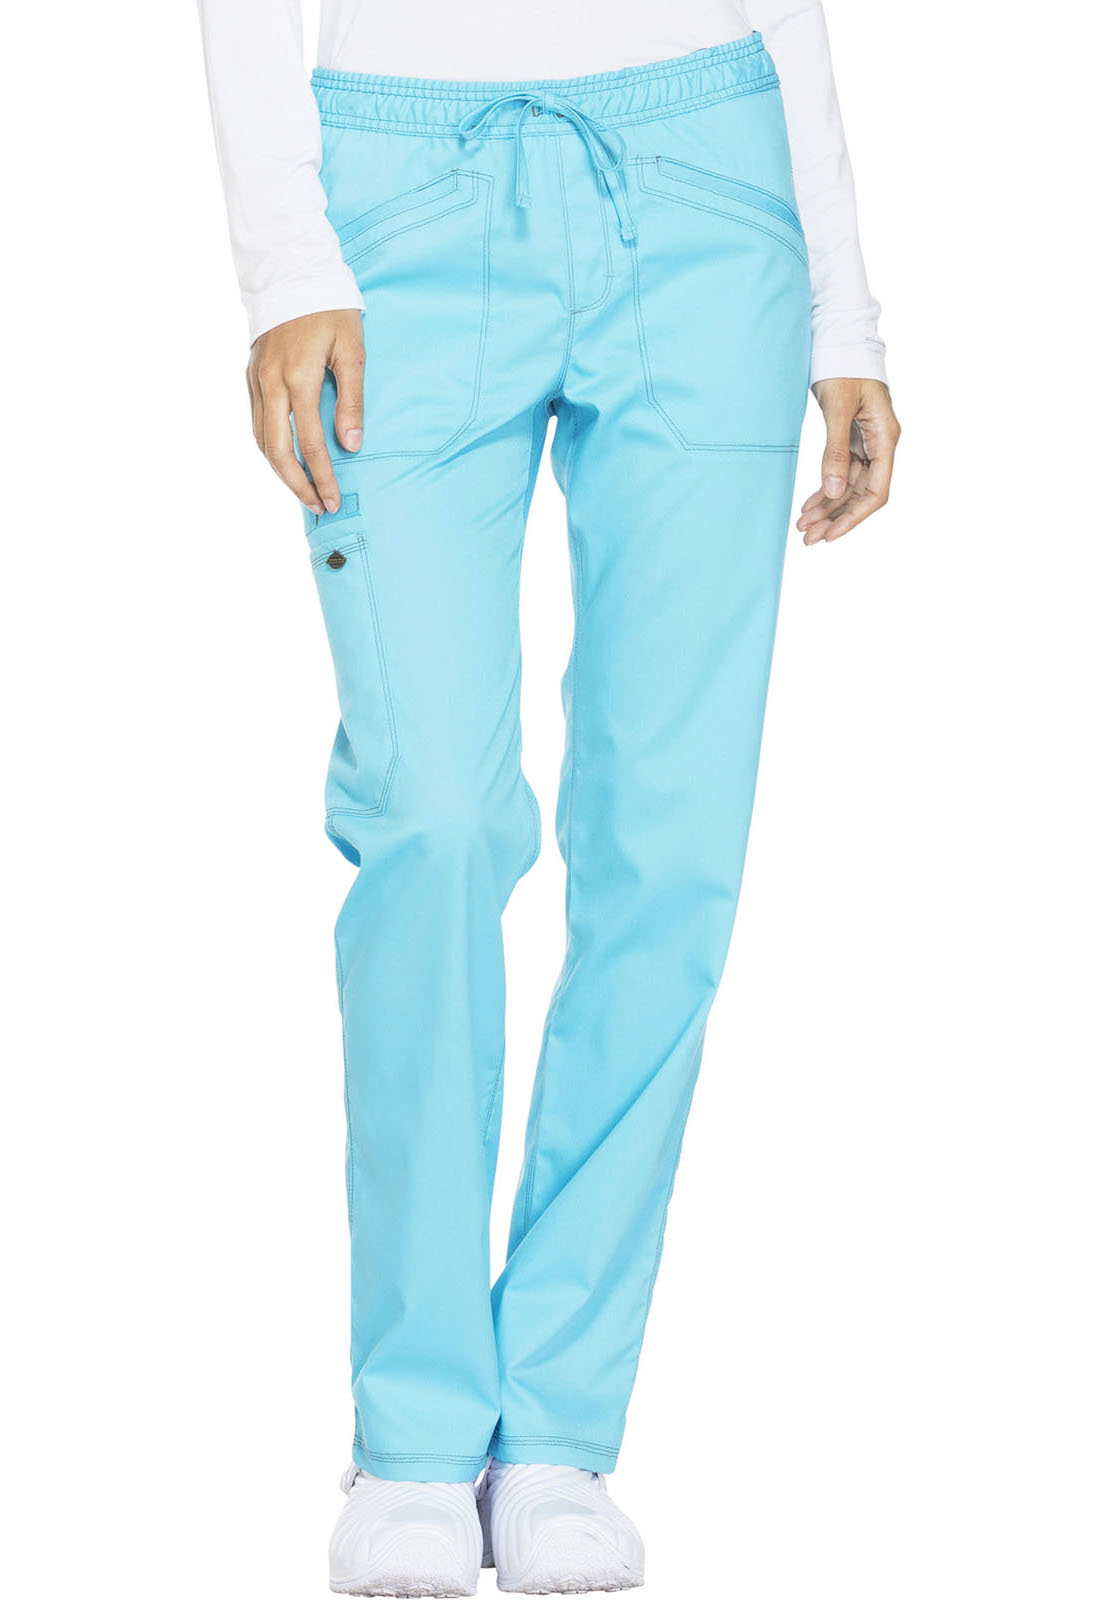 7f337b8efbf Dickies Essence Mid Rise Straight Leg Drawstring Pant in Turquoise ...